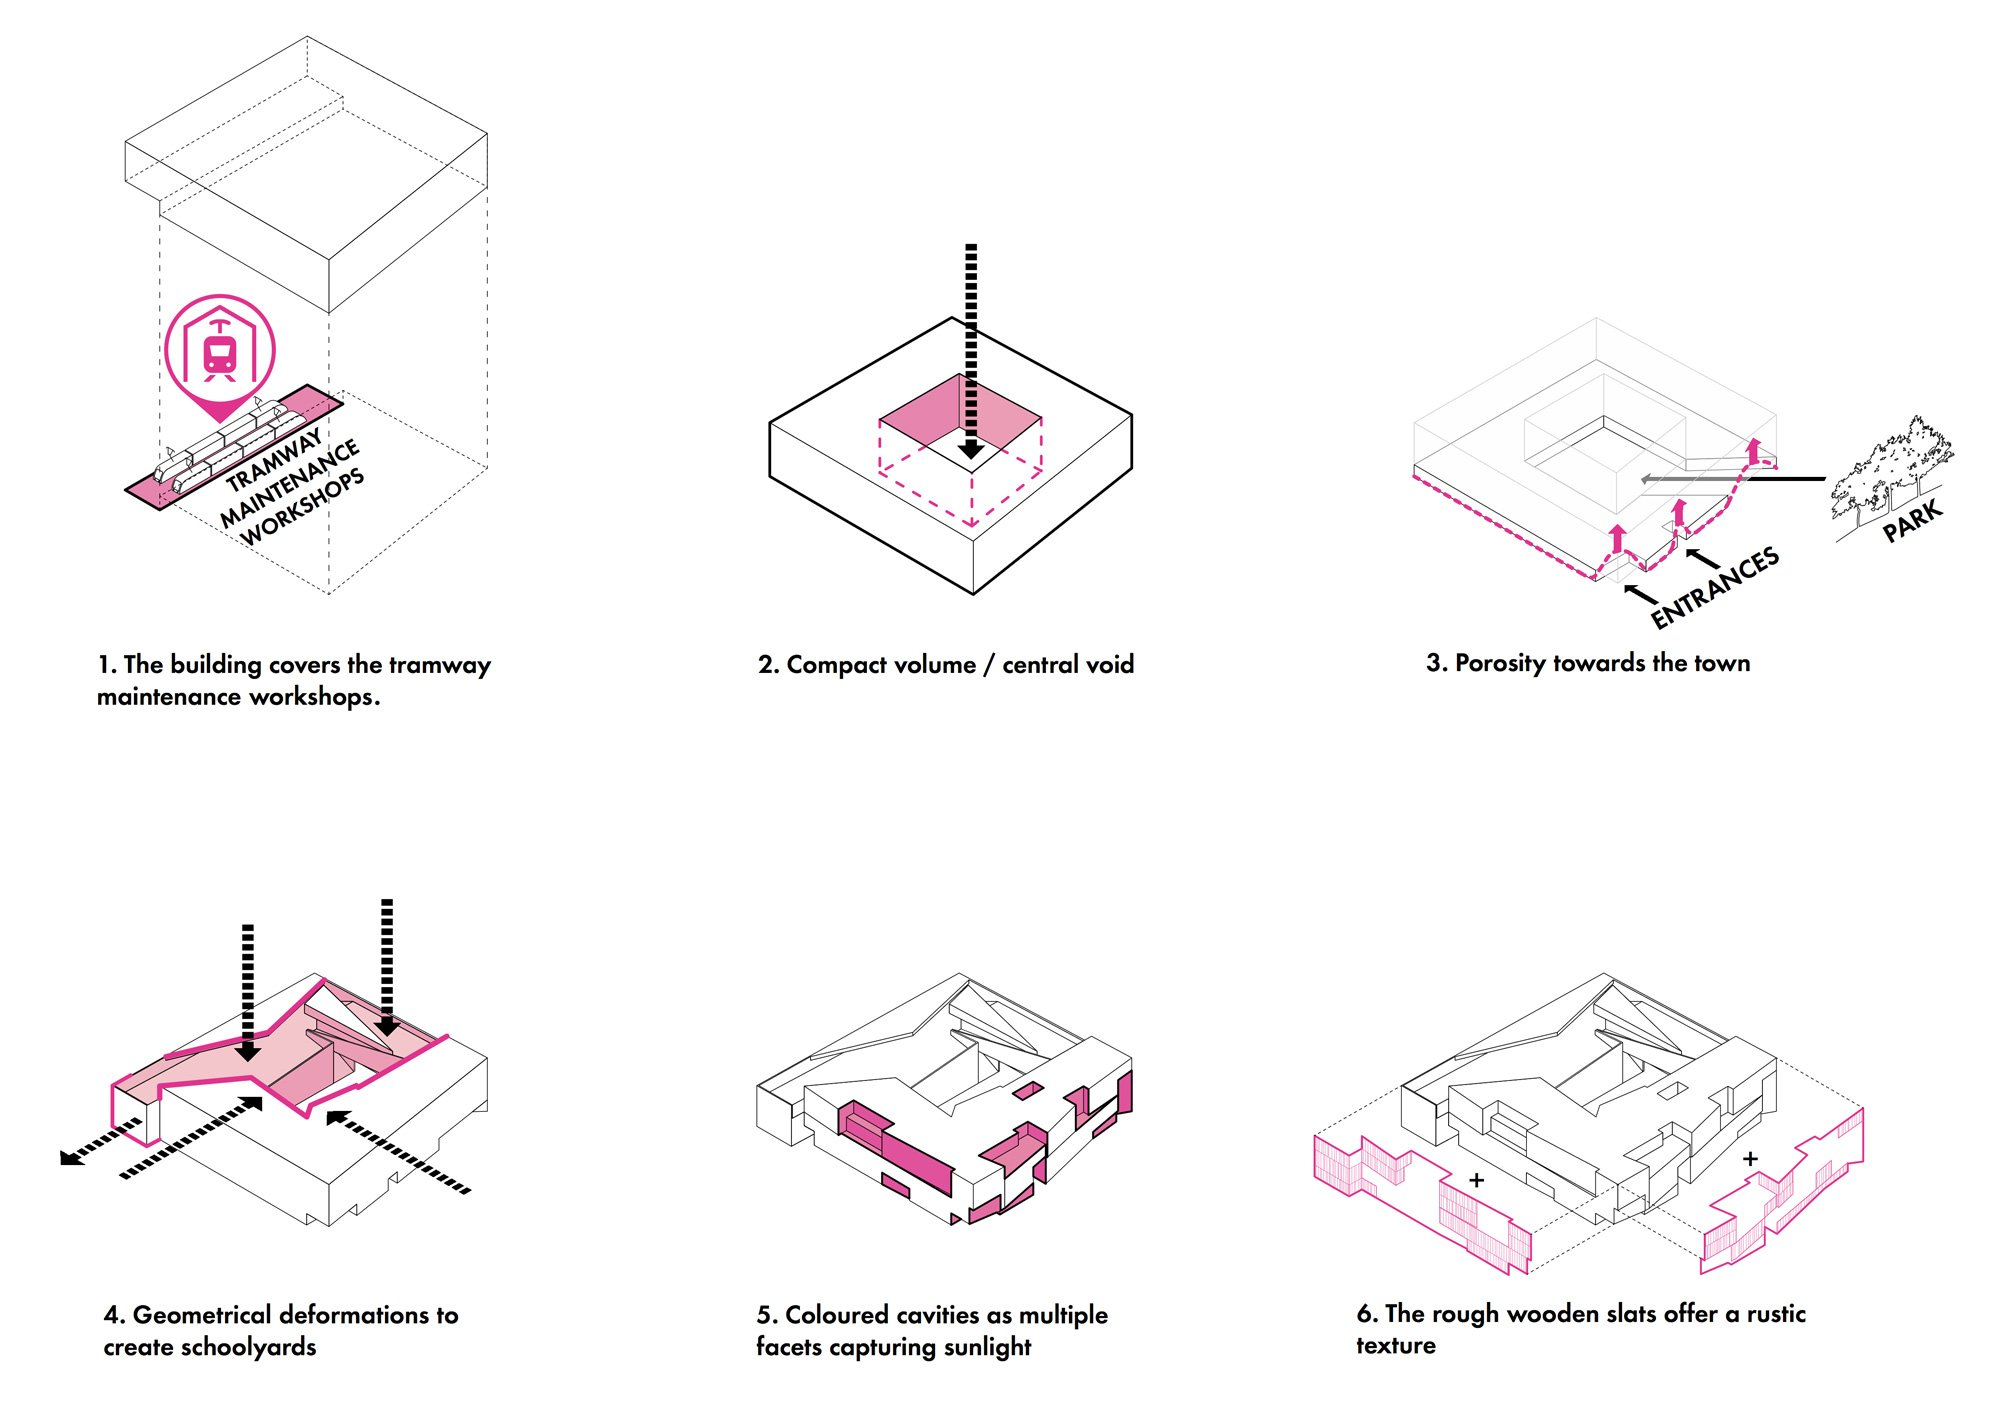 Diagramma delle origini © Dominique Coulon & associés